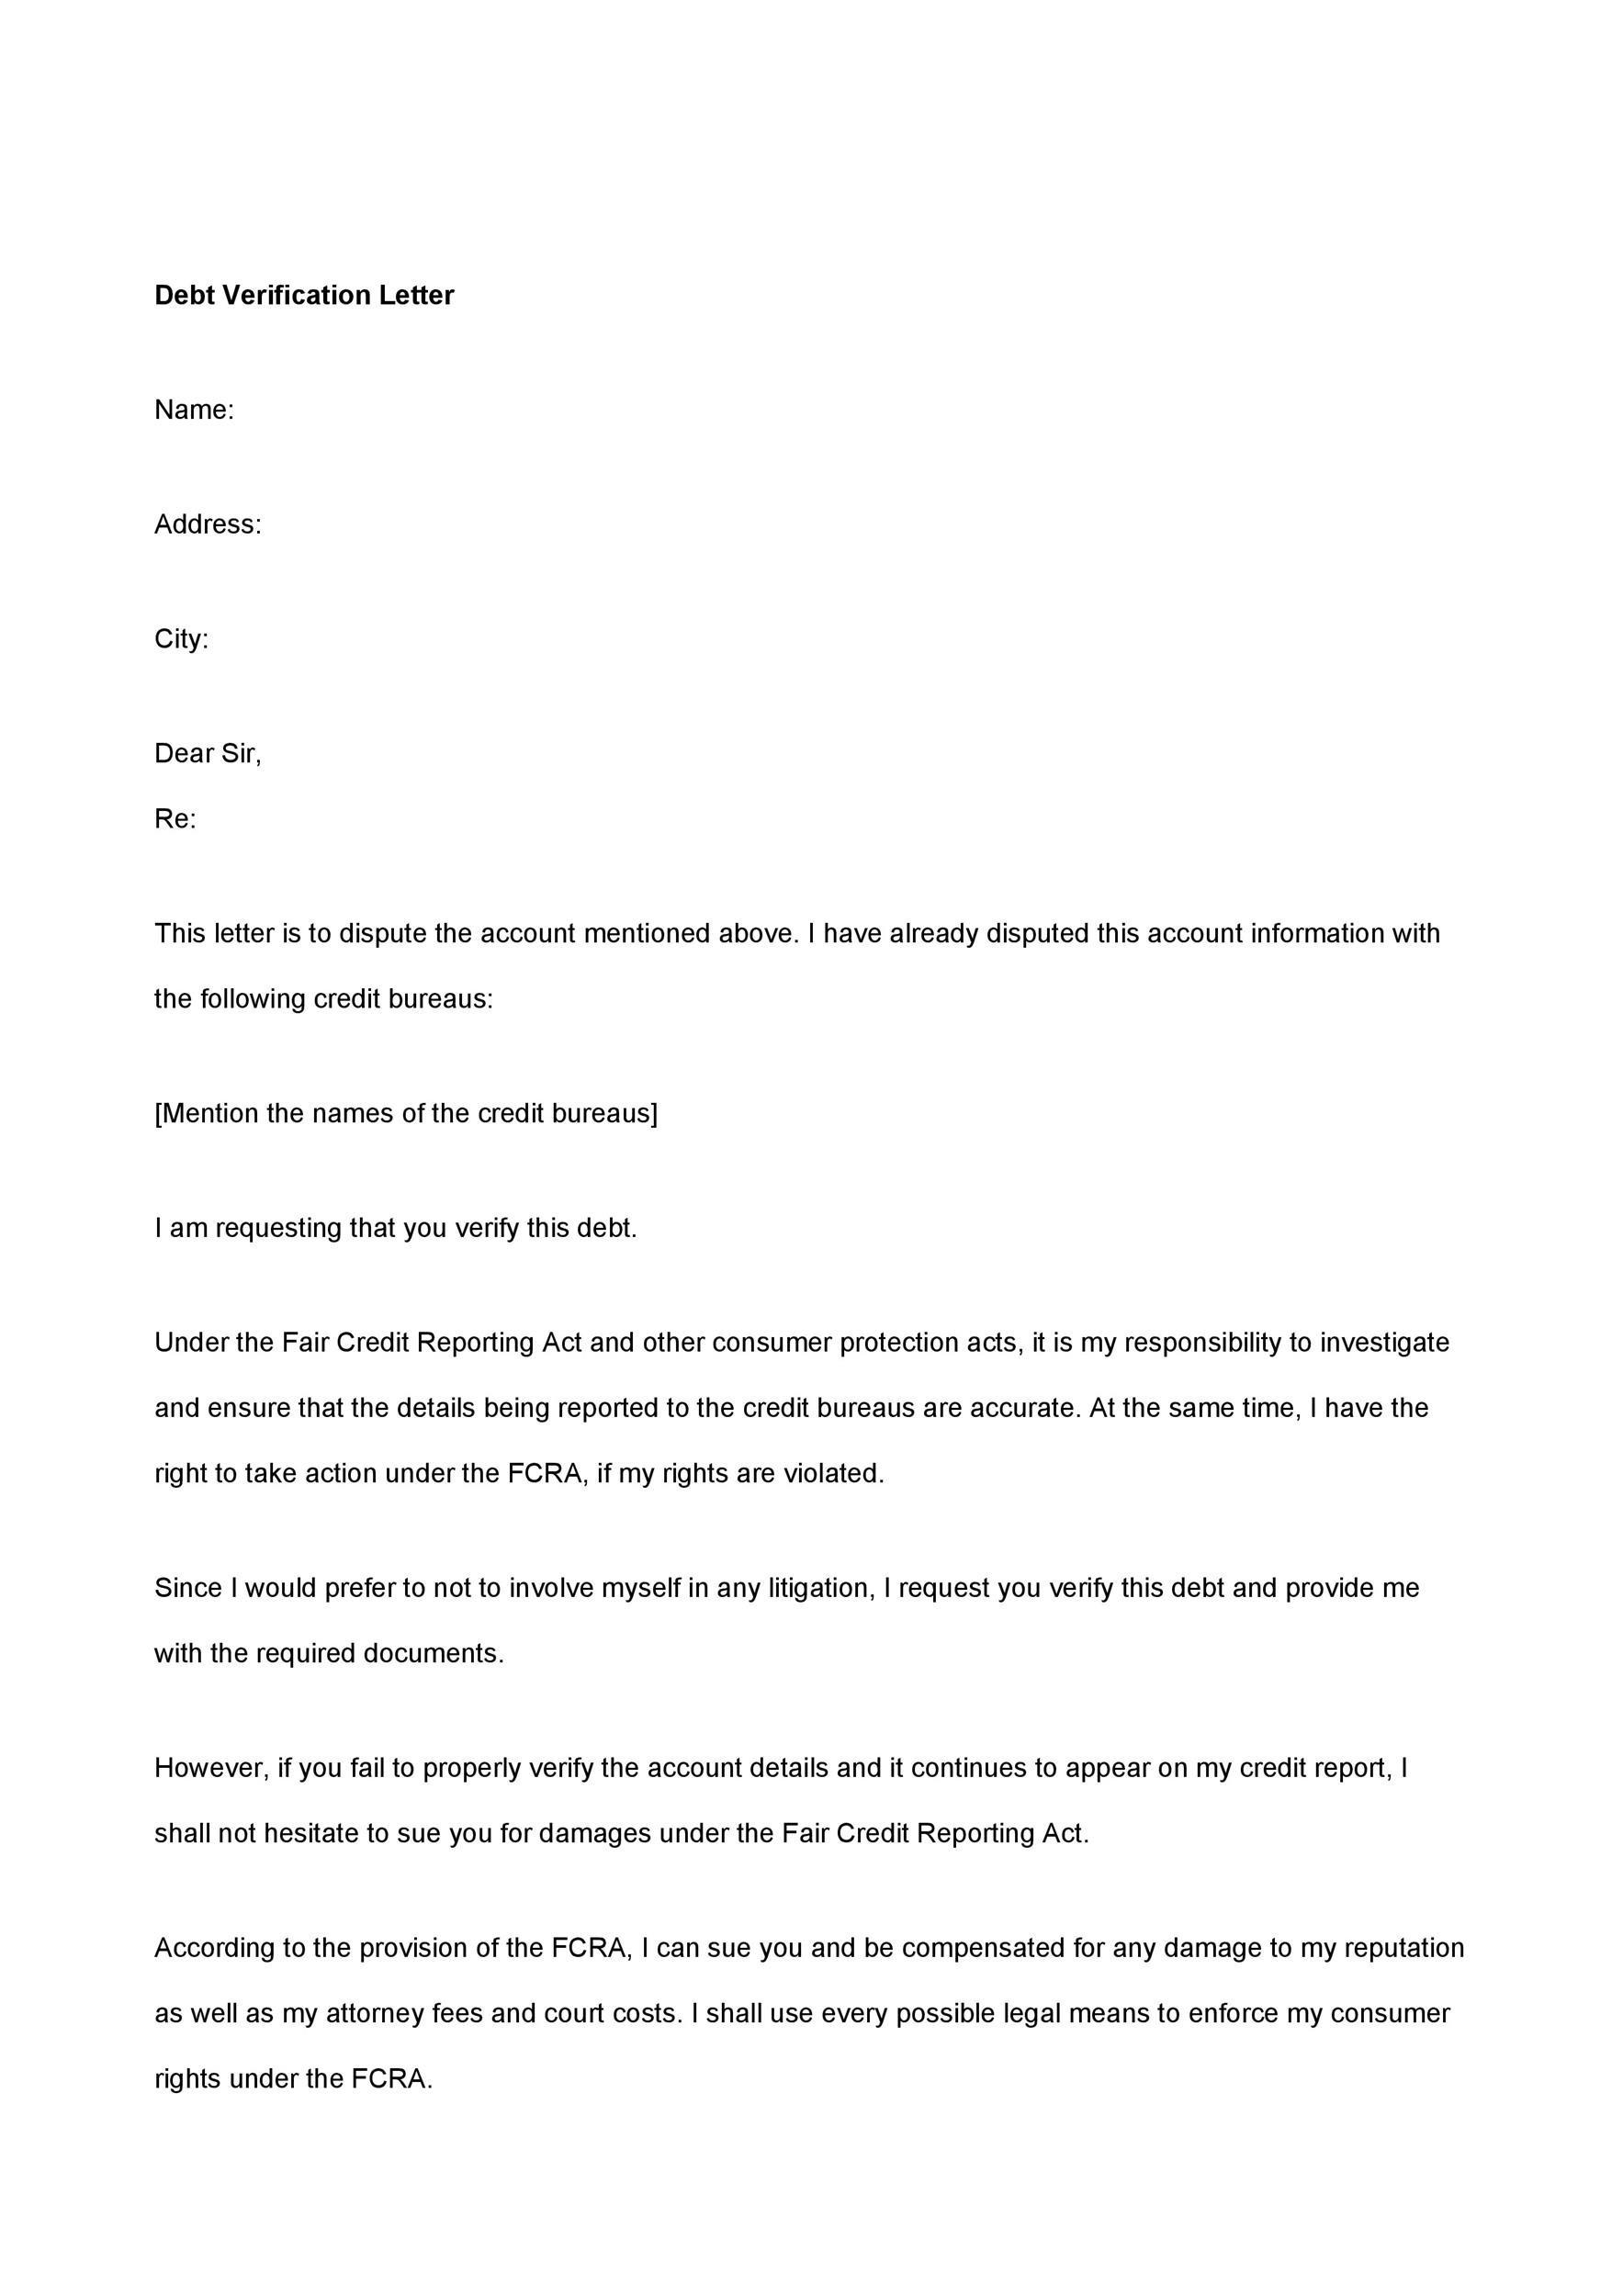 Free debt validation letter 19